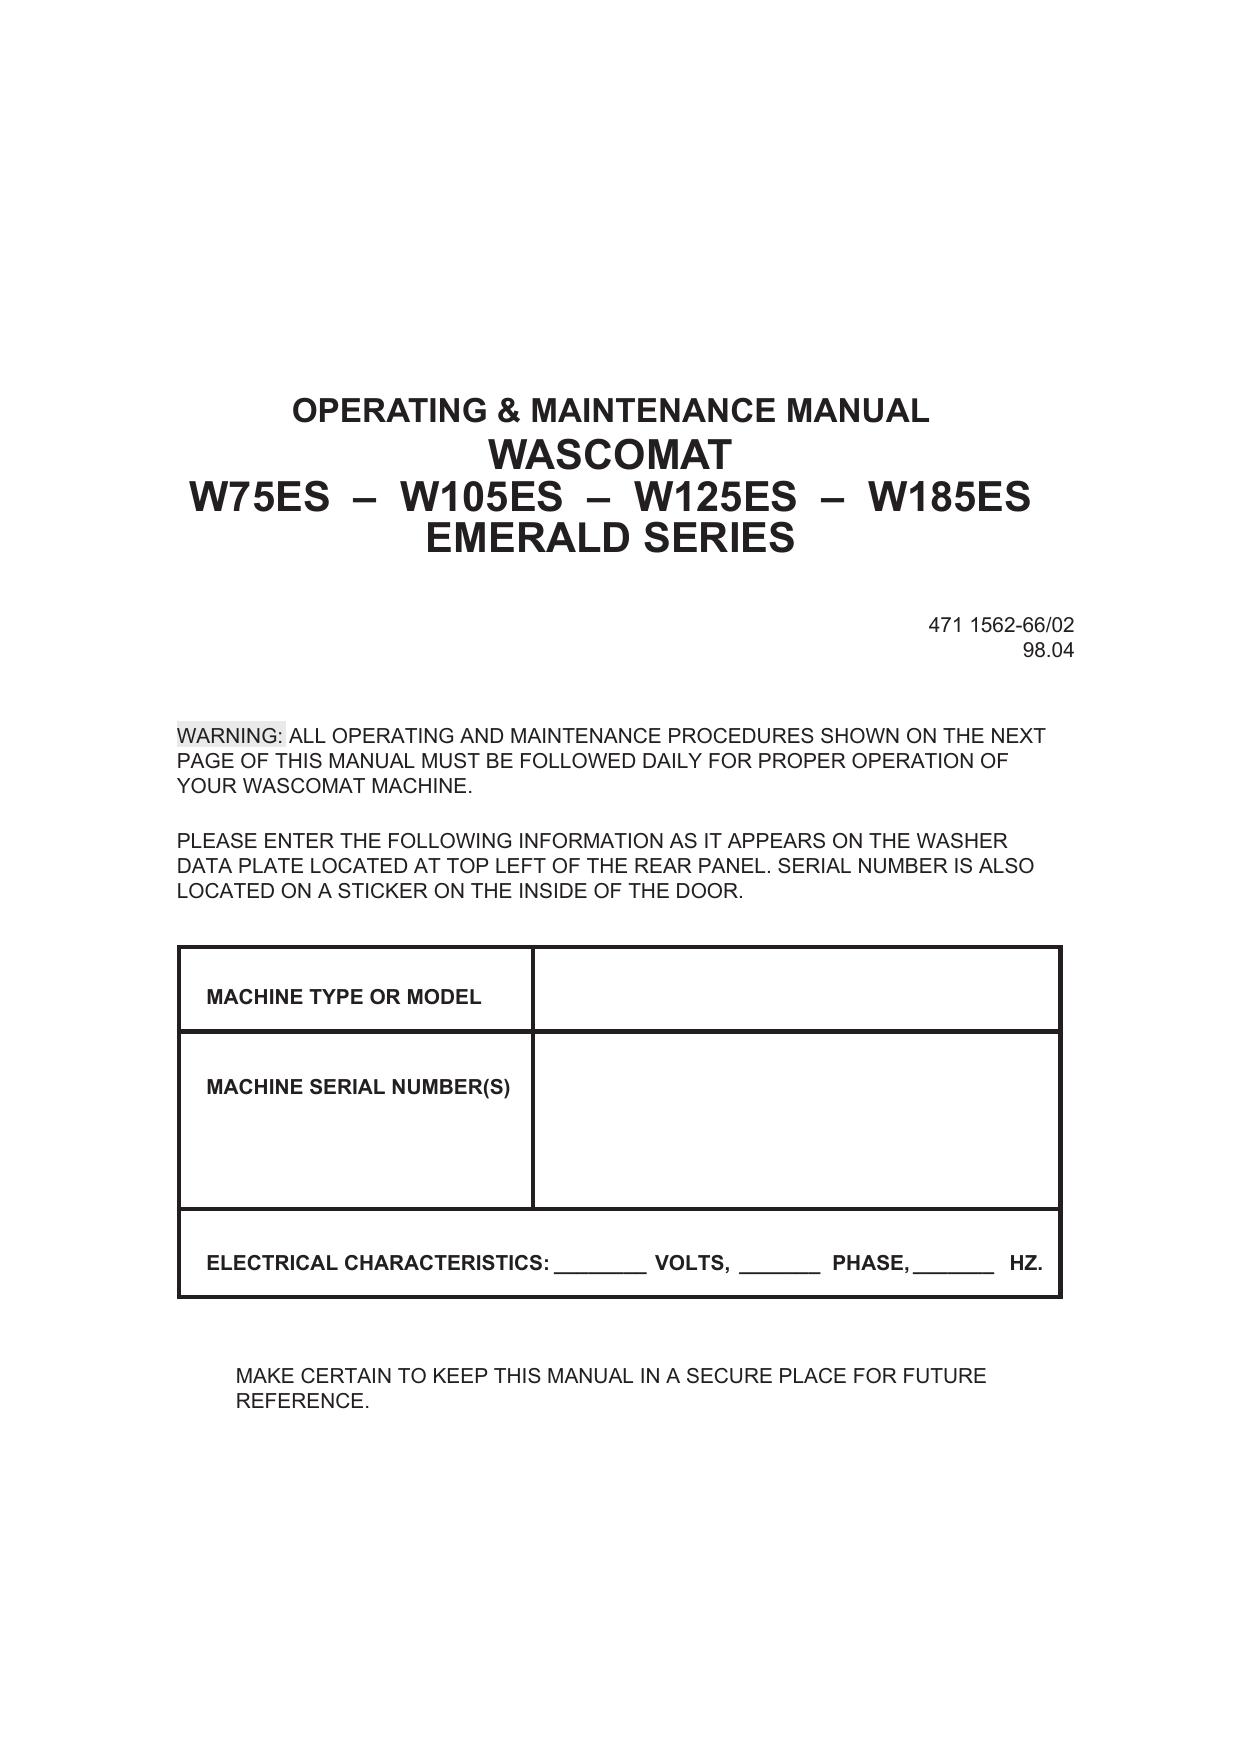 ... Array - toshiba 1350 copier manual ebook rh toshiba 1350 copier manual  ebook zettadata so